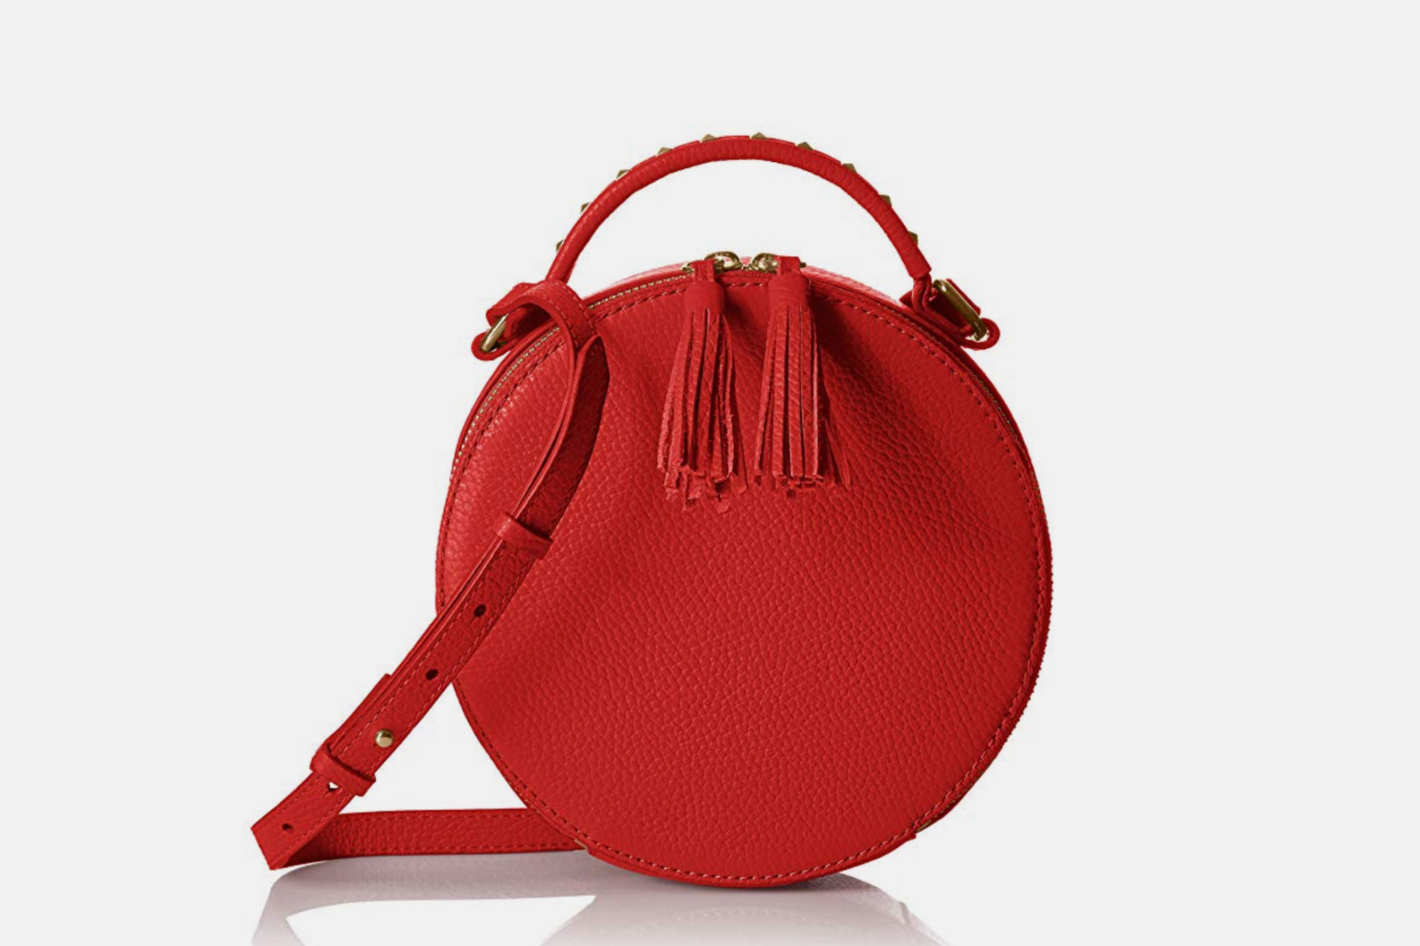 The Fix Hampton 2 Crossbody Leather Circle Bag